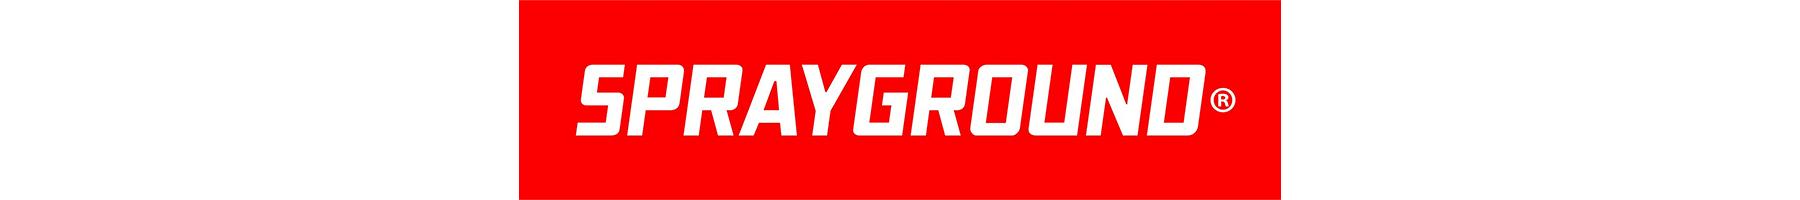 DrJays.com - Sprayground